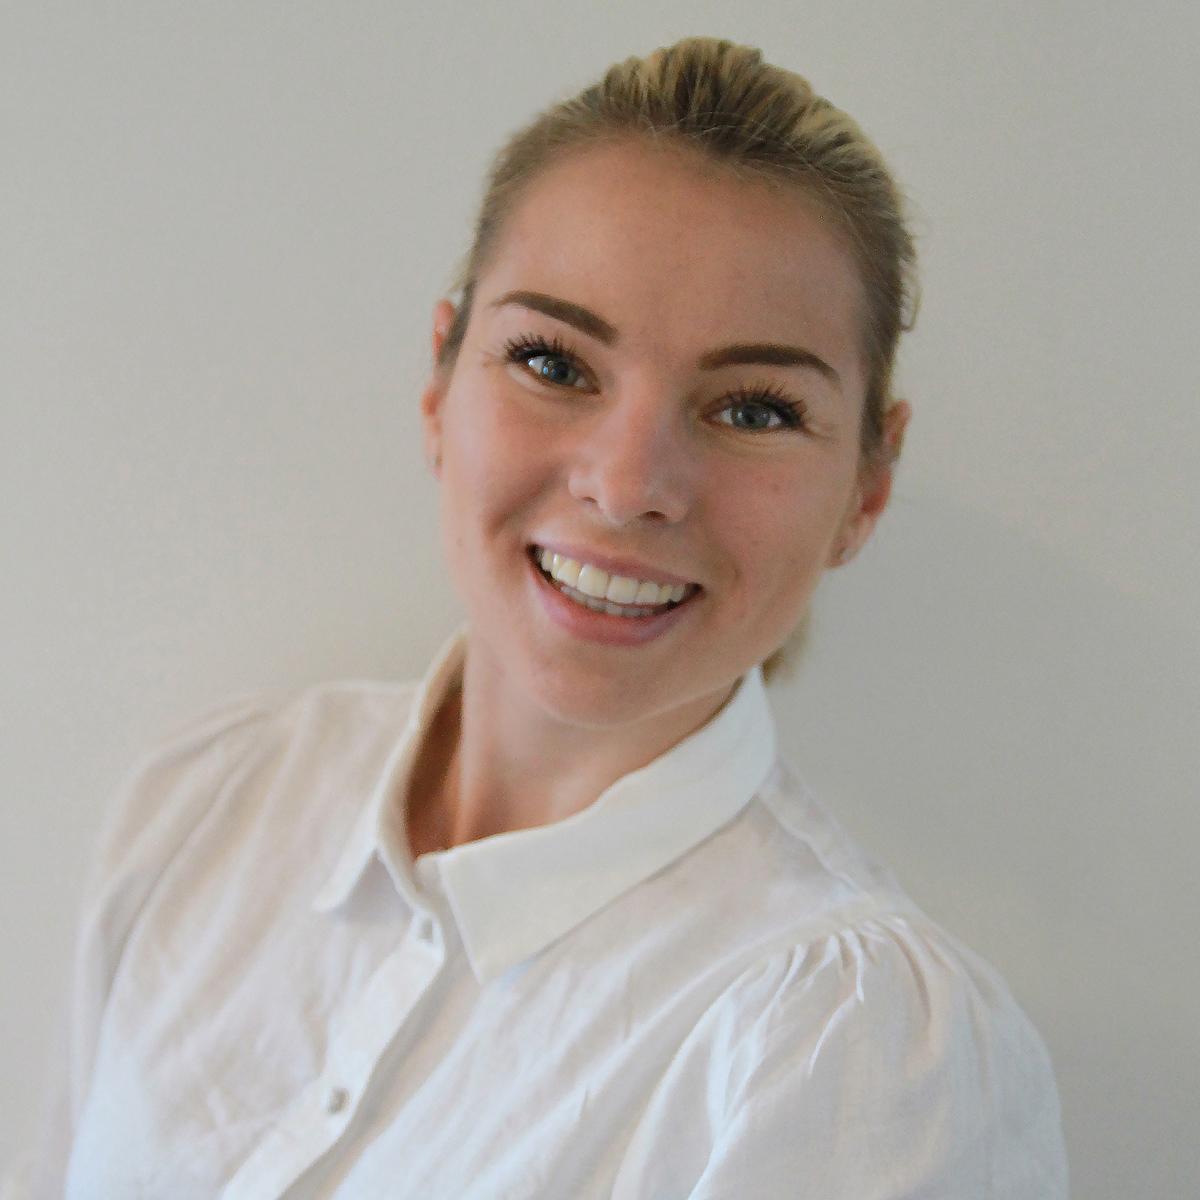 Bianca Furtner Digitales Marketing Für Team Grün